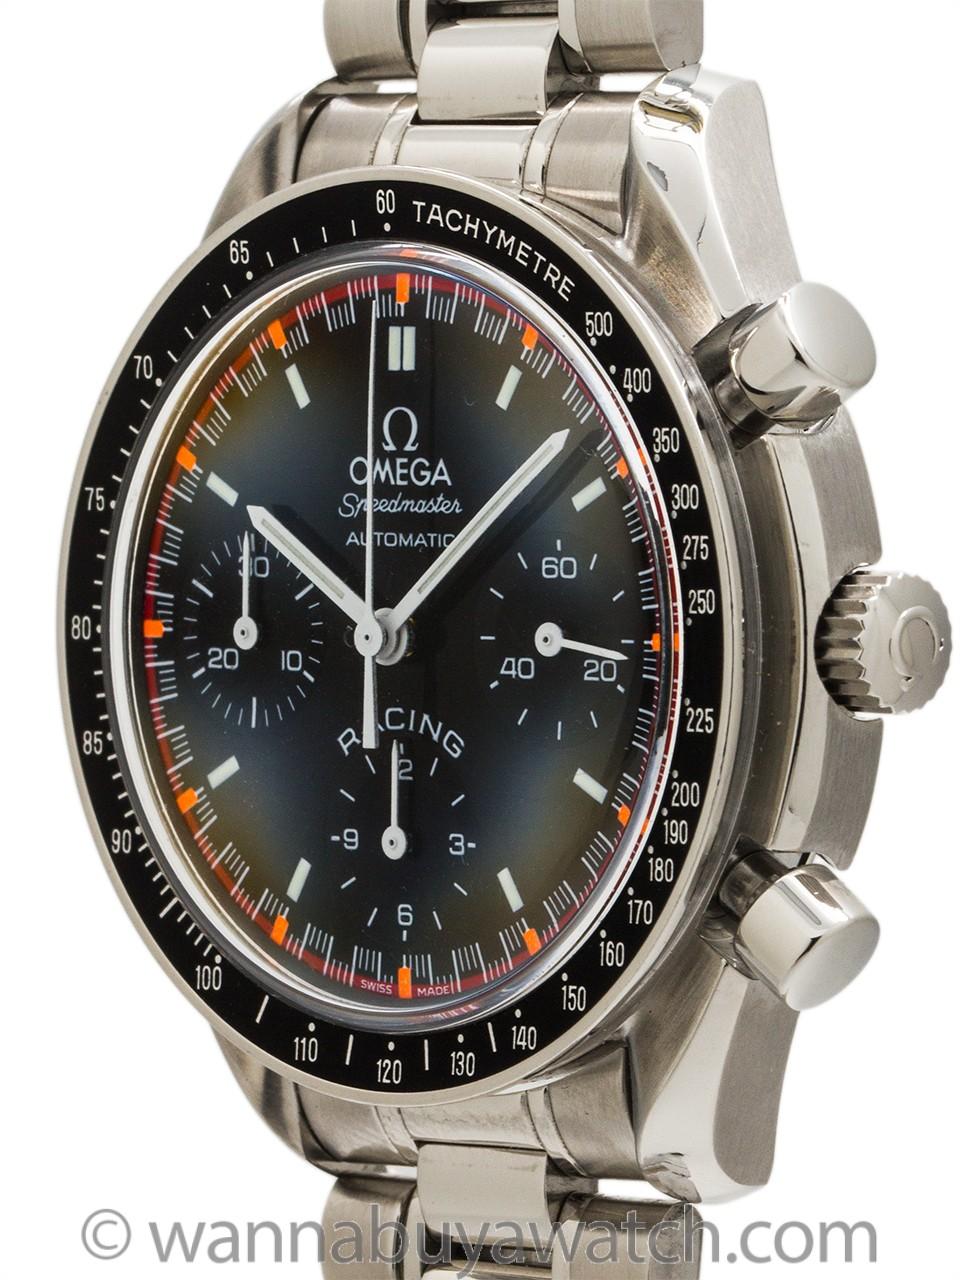 Omega Speedmaster Automatic Racing ref 3518.50 Michael Schumacher circa 2000